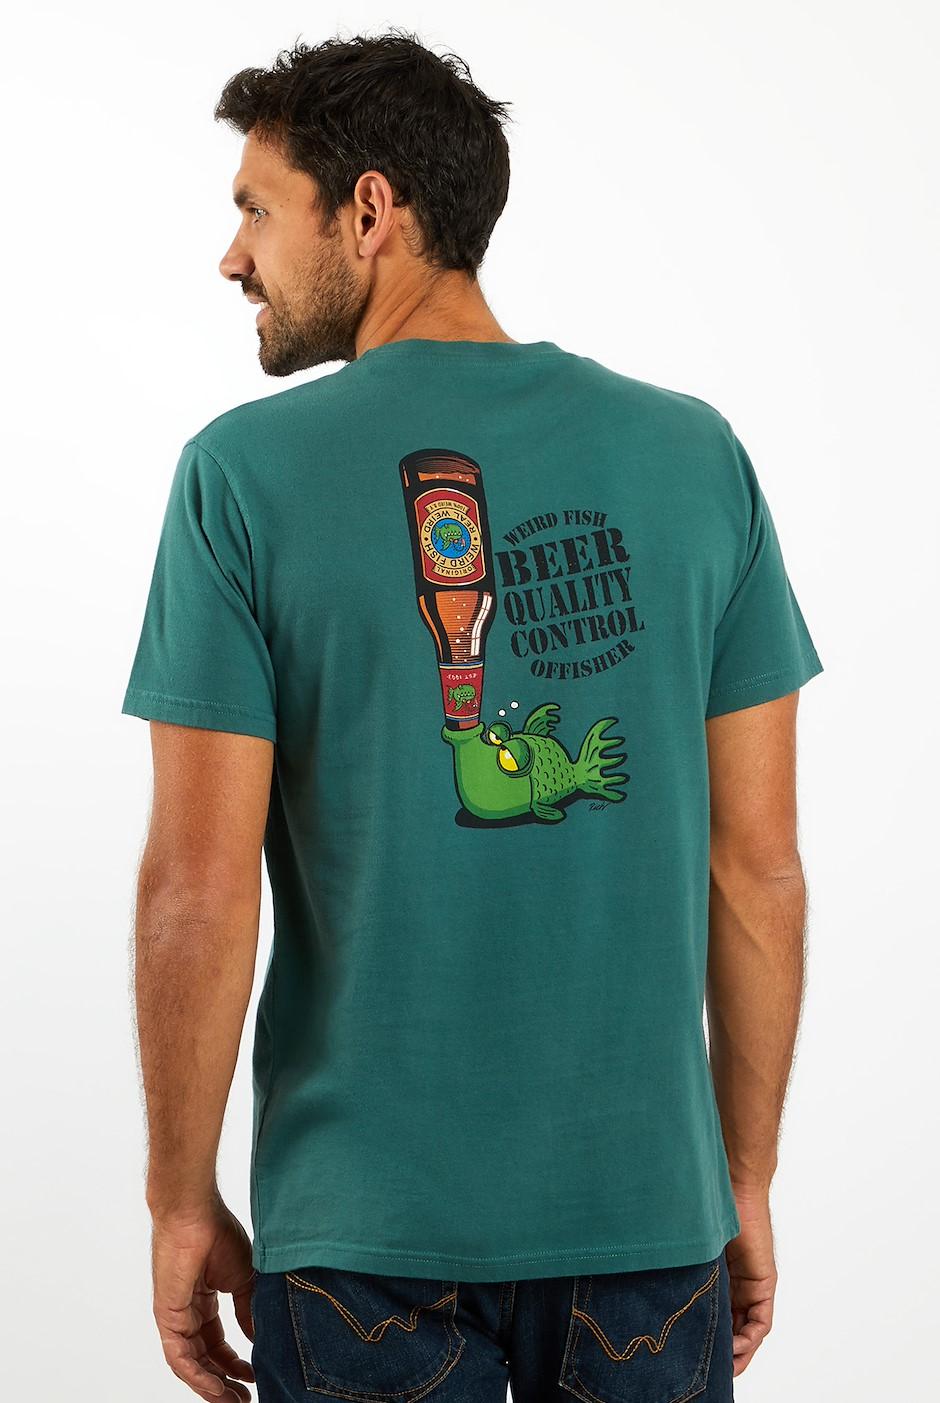 Beer Offisher Artist T-Shirt Dark Green